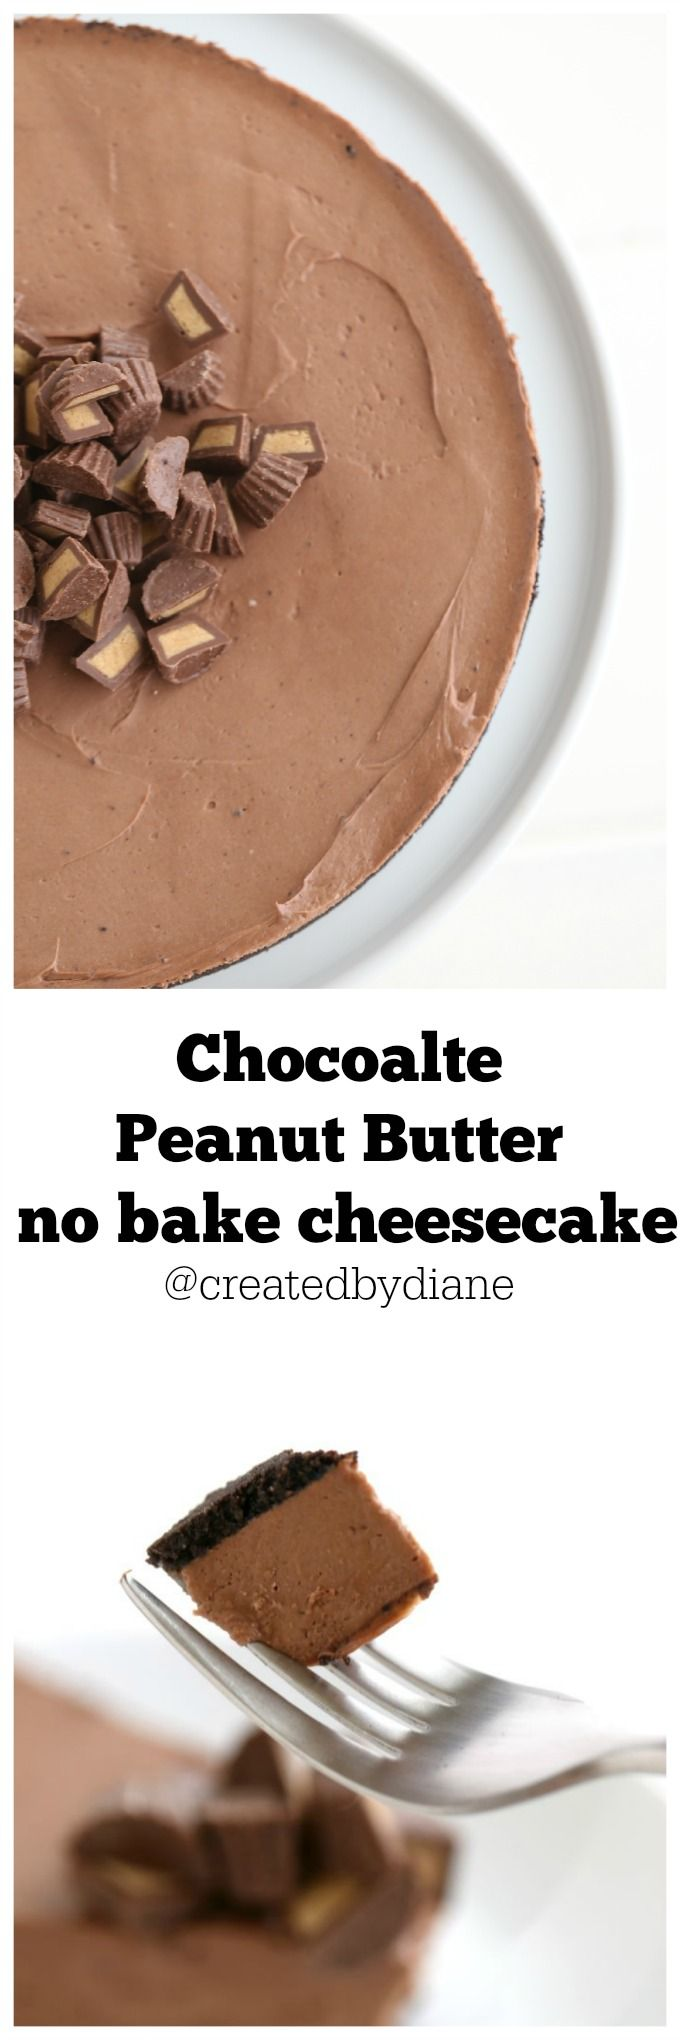 Chocolate Peanut Butter no bake Cheesecake @createdbydiane